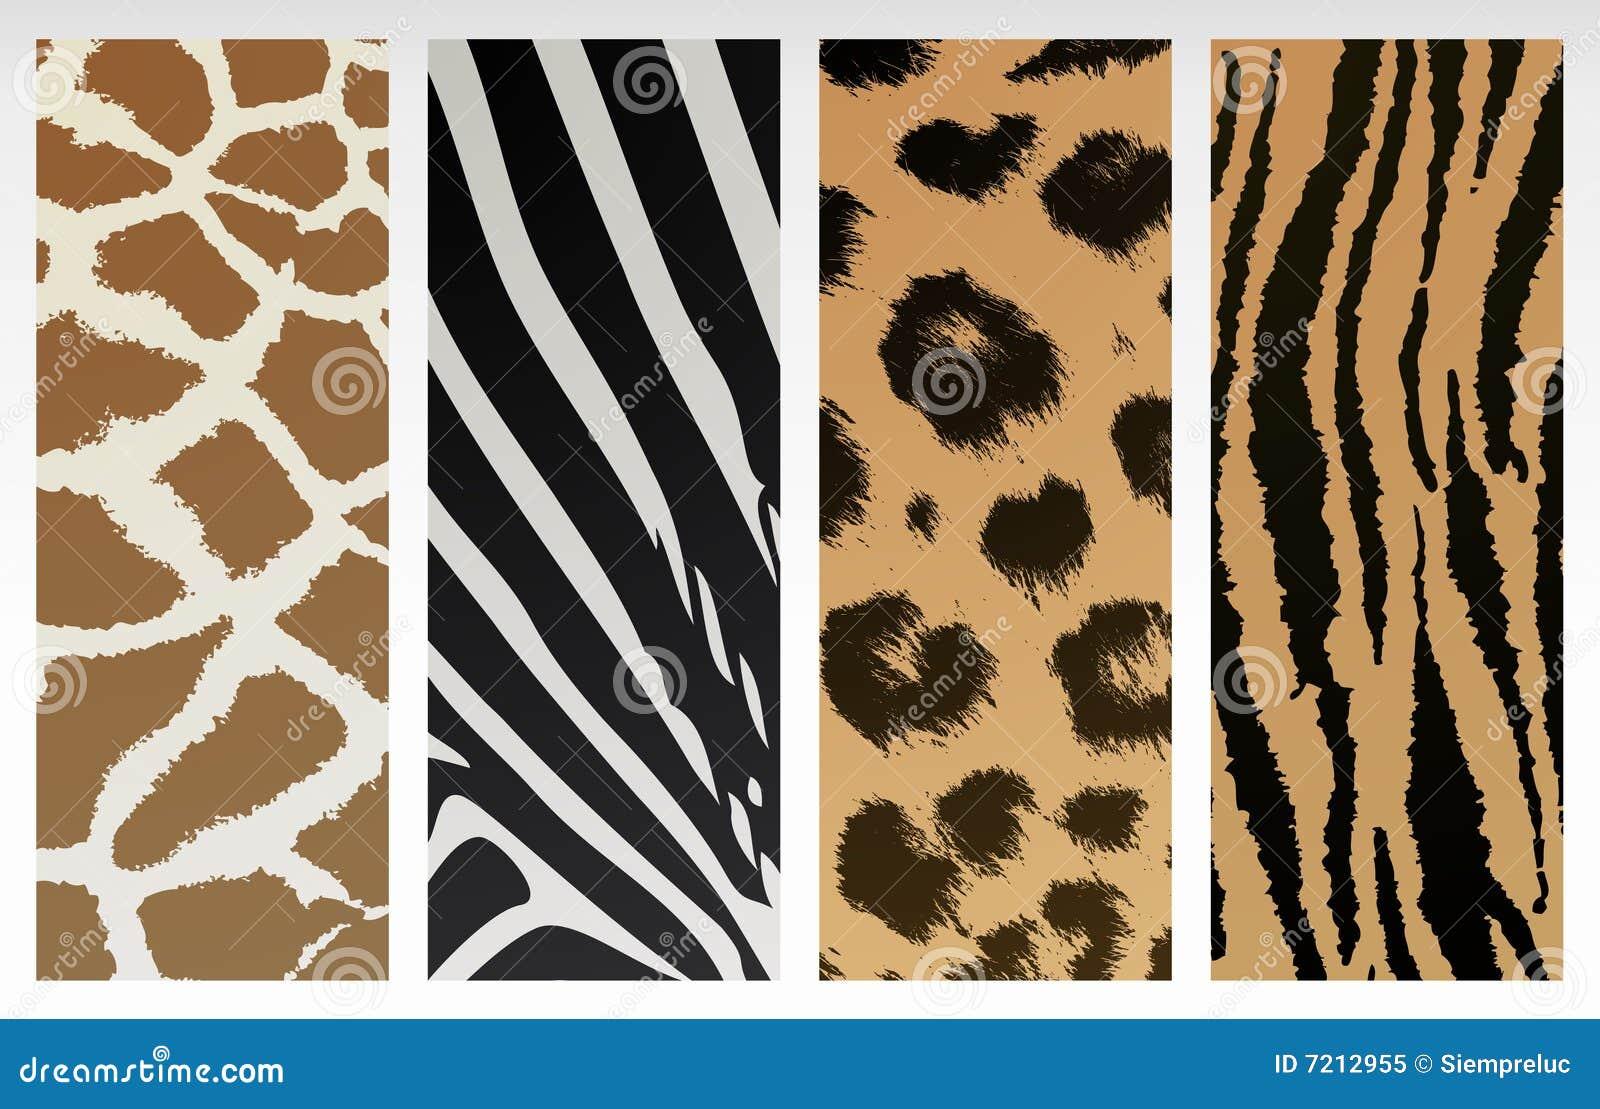 clip art animal print - photo #35